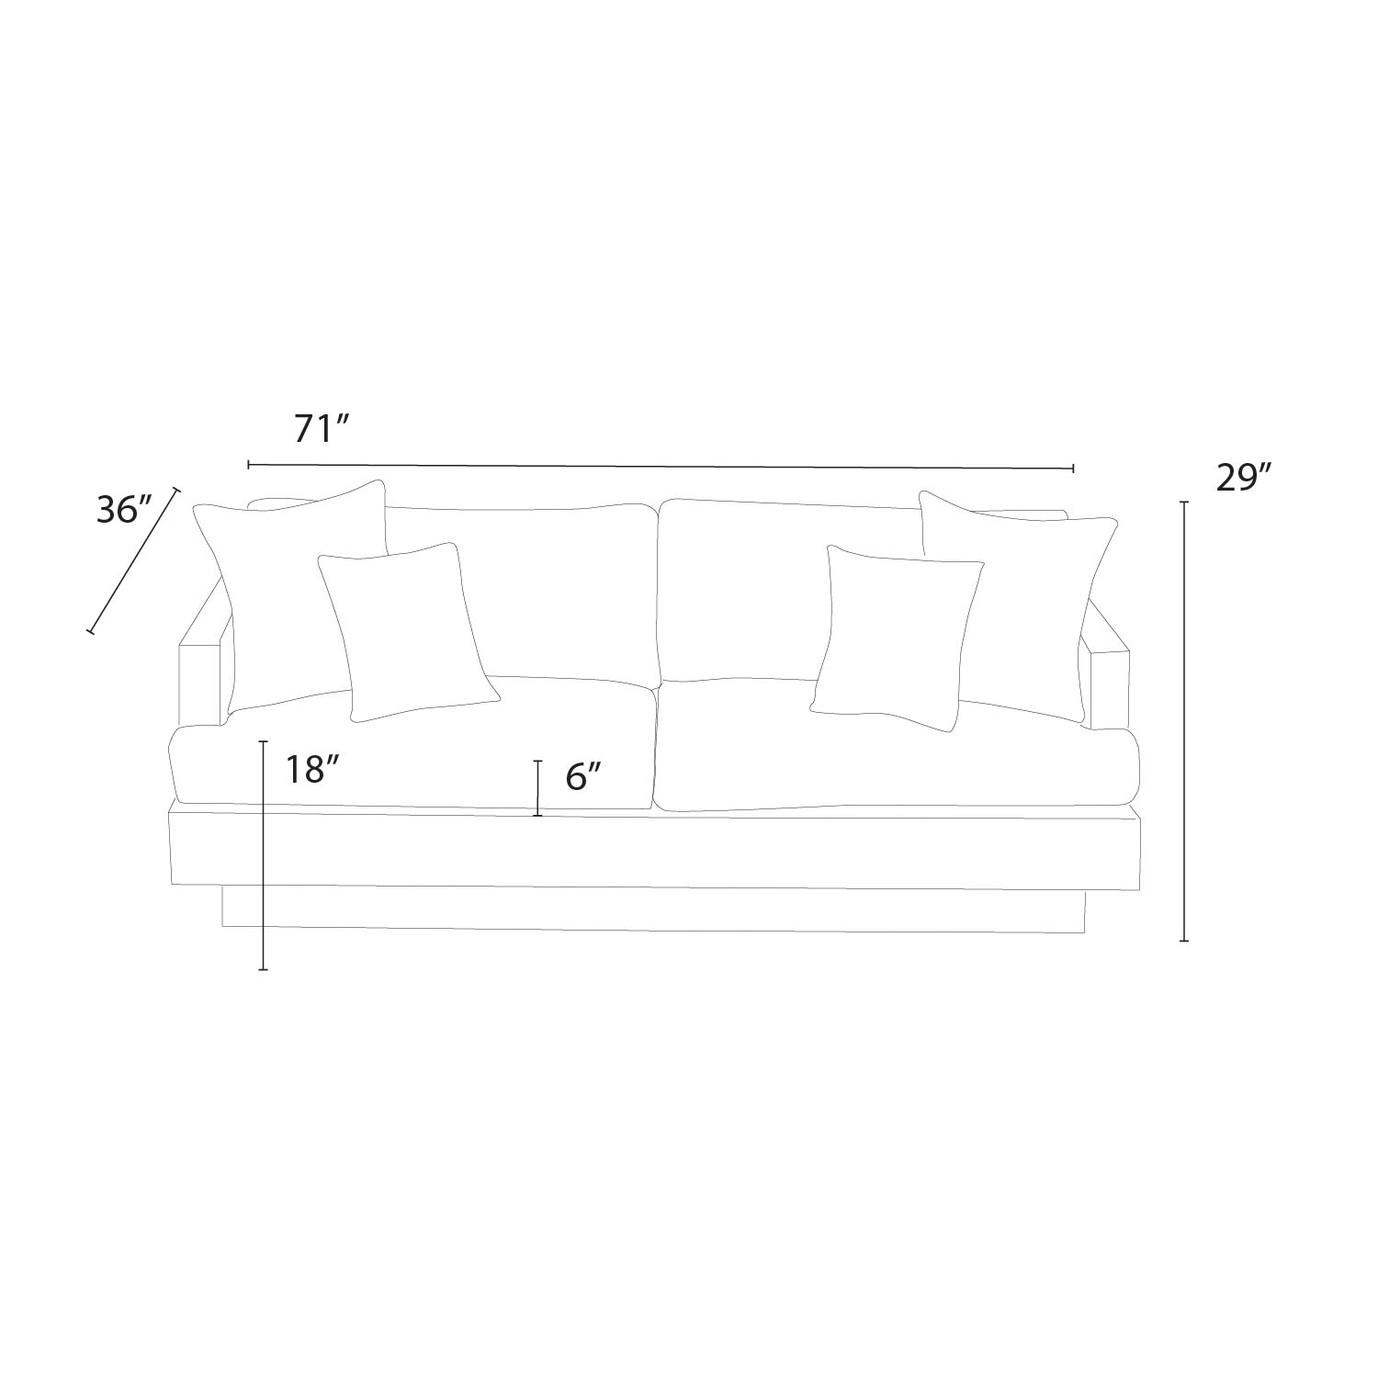 Portofino™ Comfort 71in Sofa - Heather Beige